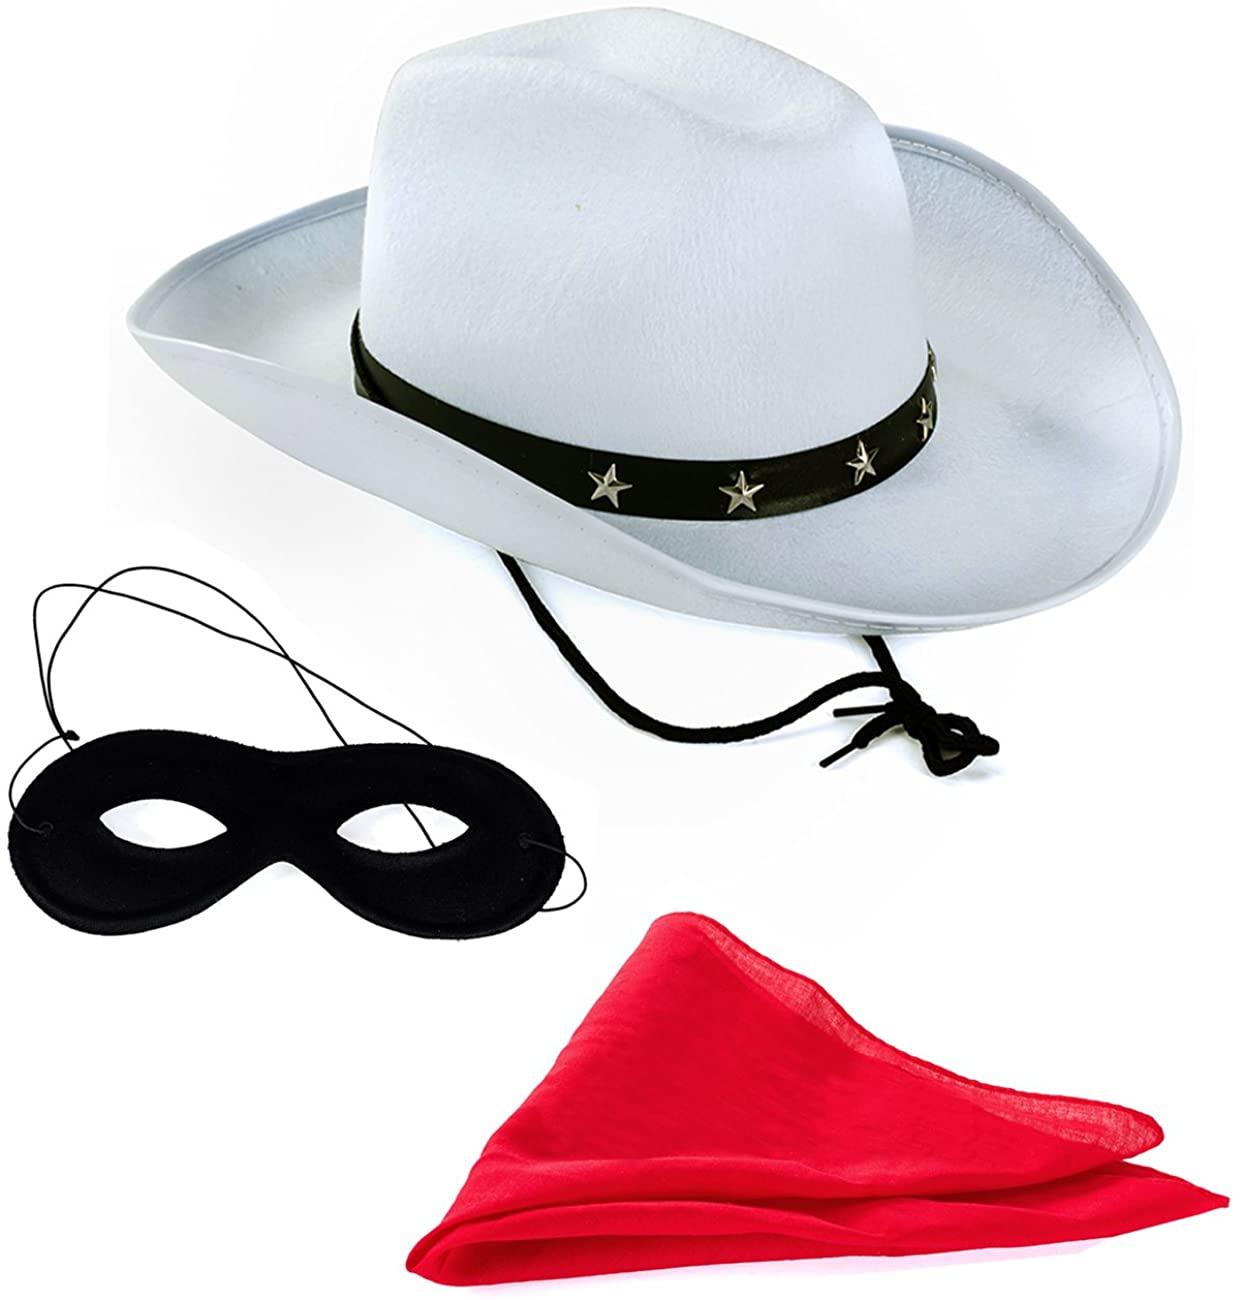 Tigerdoe Texas Ranger – 3 Pc Set - Masked Ranger - Western Costume - Wild West Costumes White